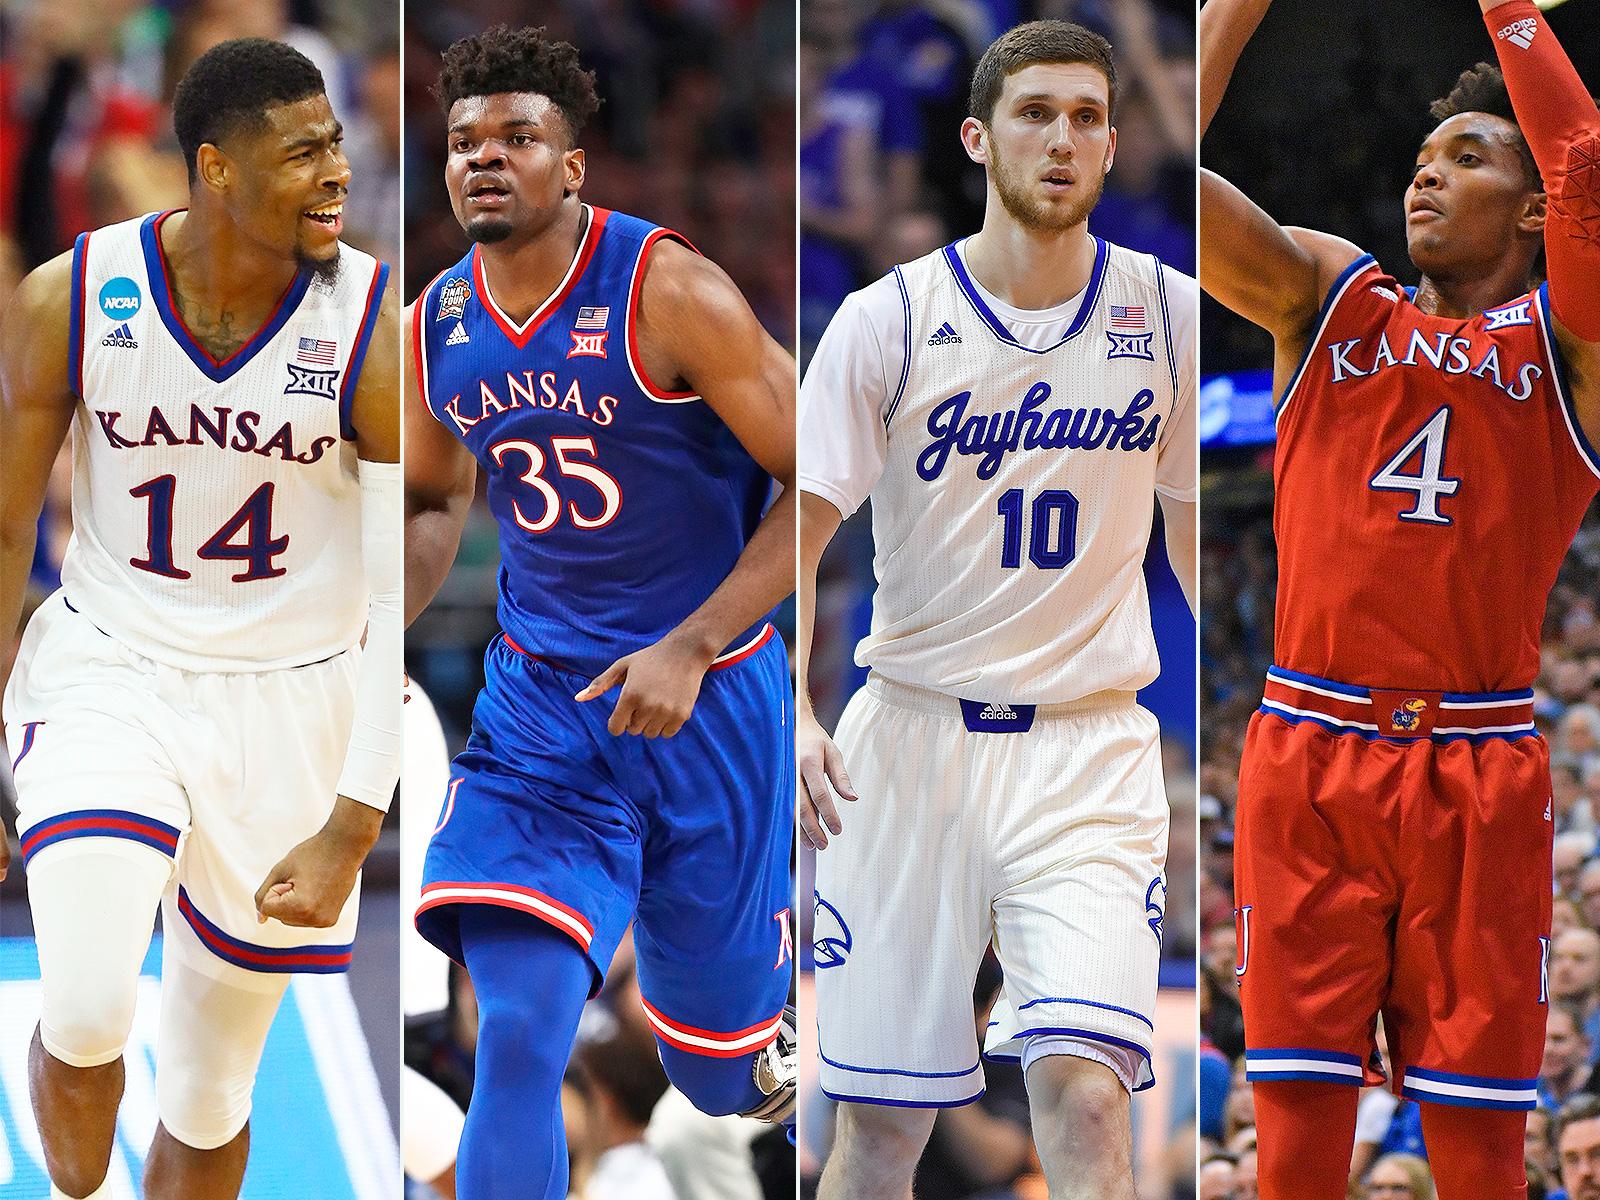 College Basketball Best Uniforms Unc Ucla Lead Ranking Si Com